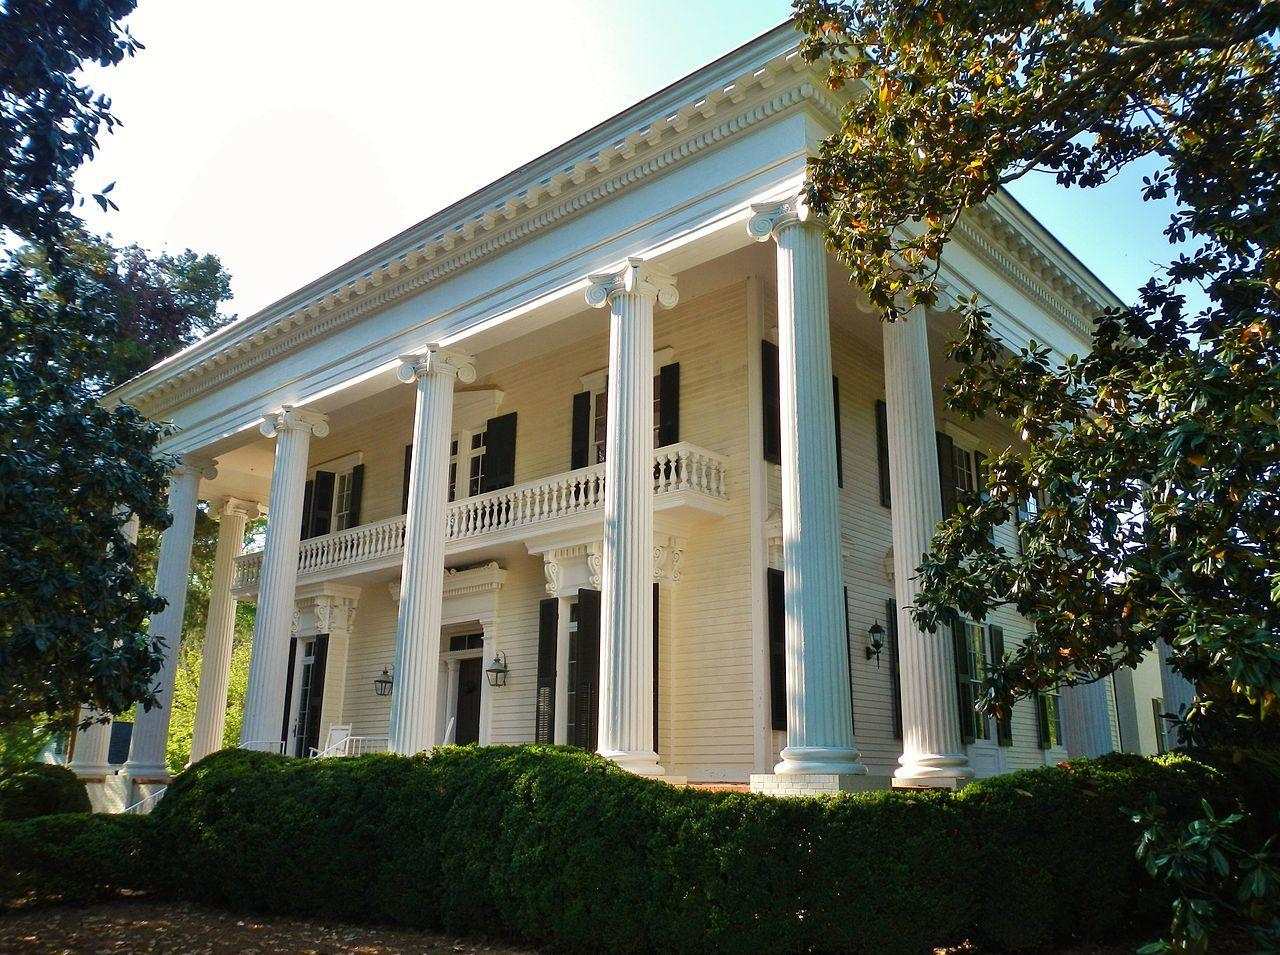 Bellevue in Troup County, Georgia.